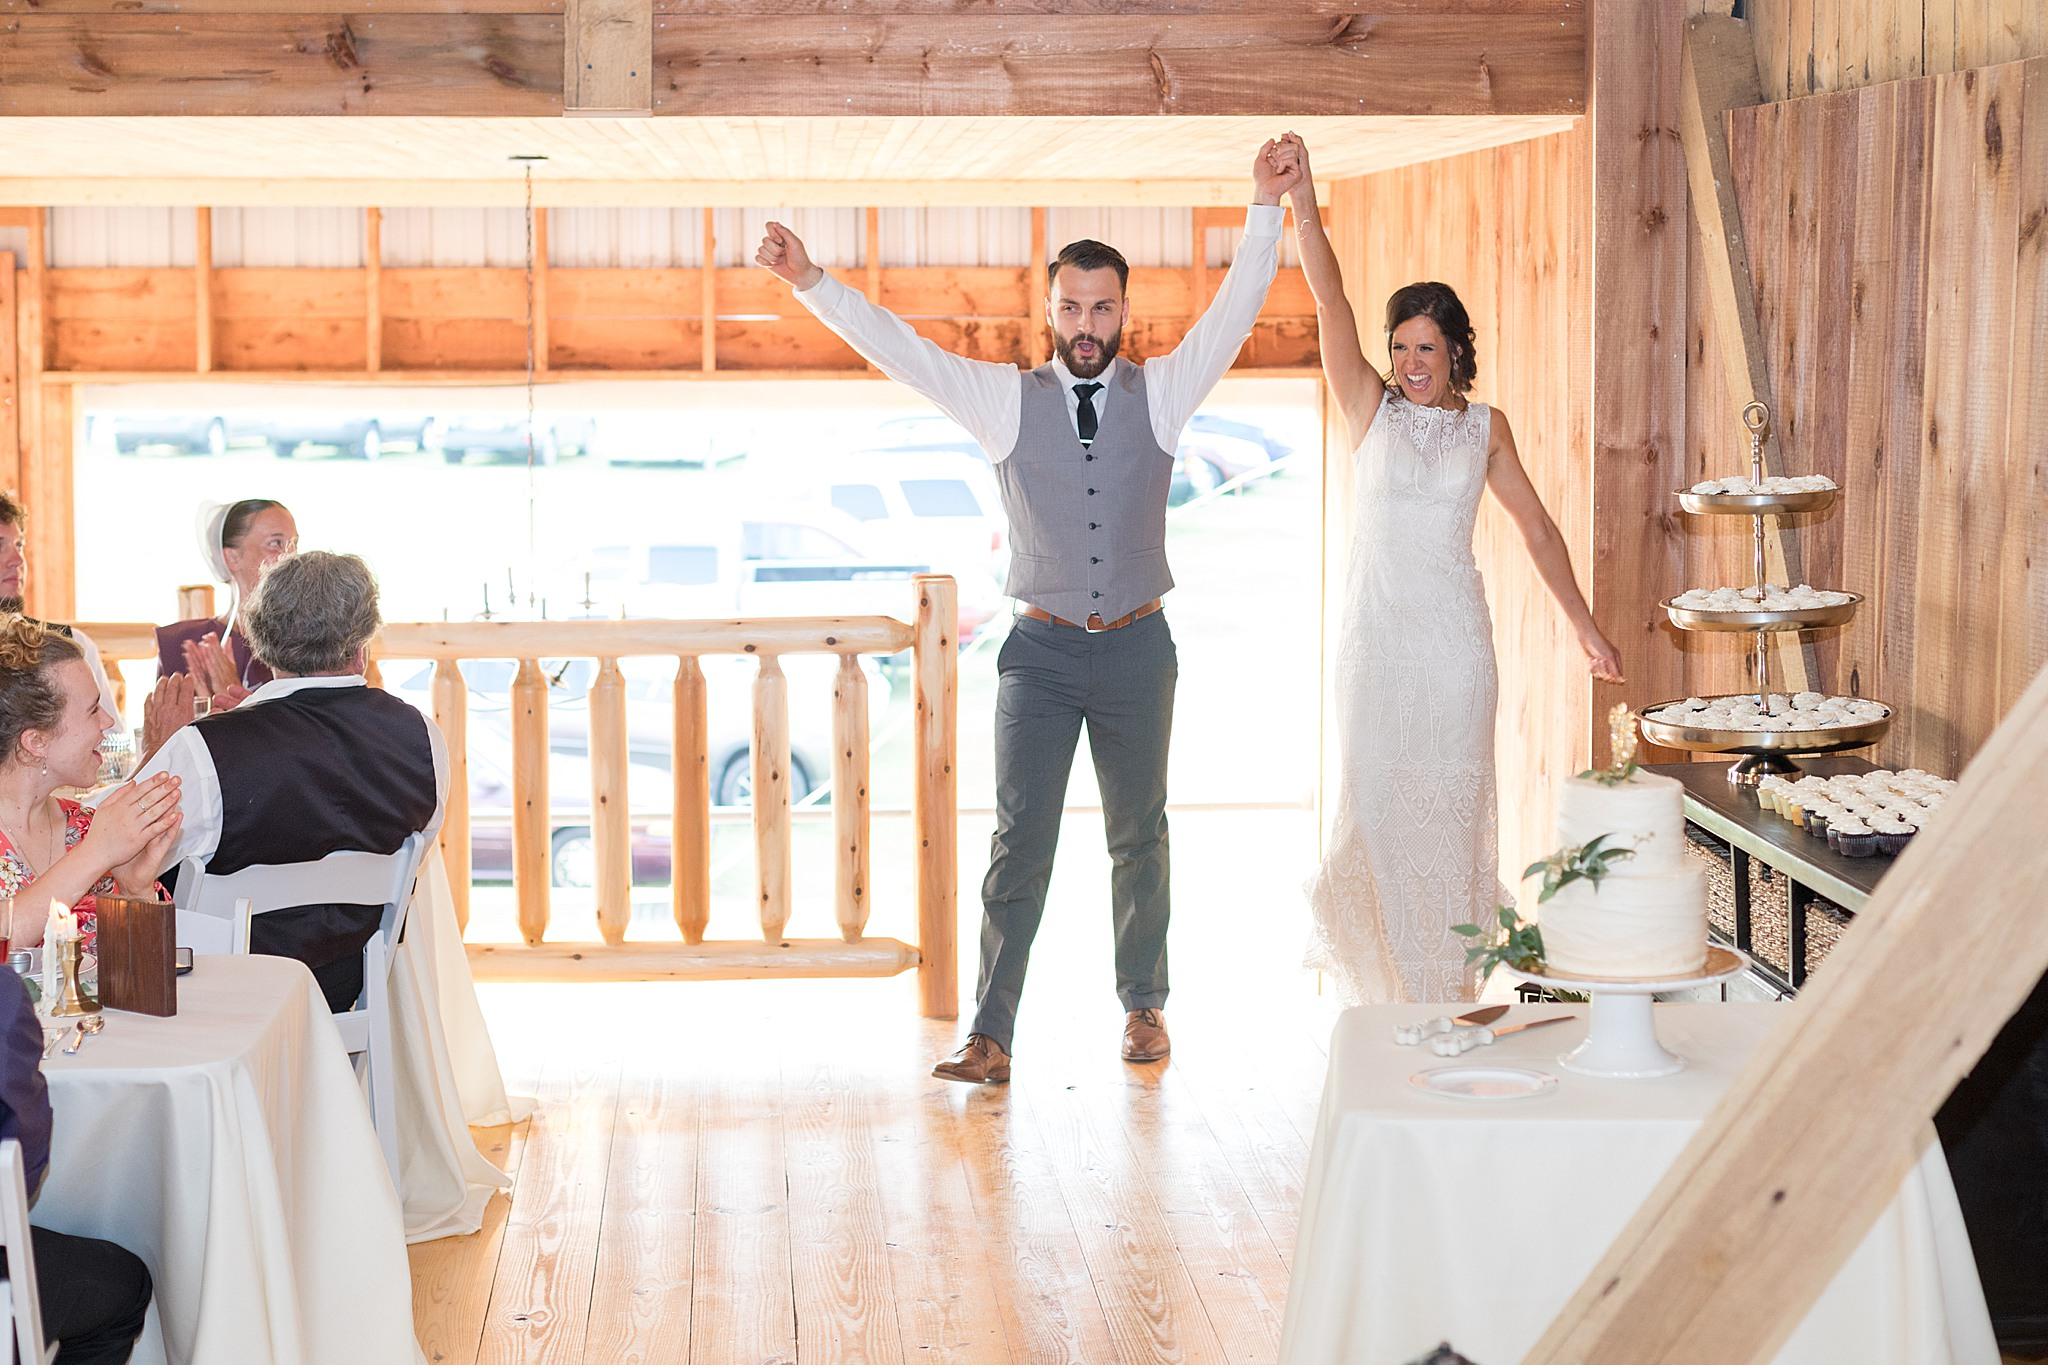 Simmontown wedding Barn Lancaster PA wedding engagement Photography_3639.jpg